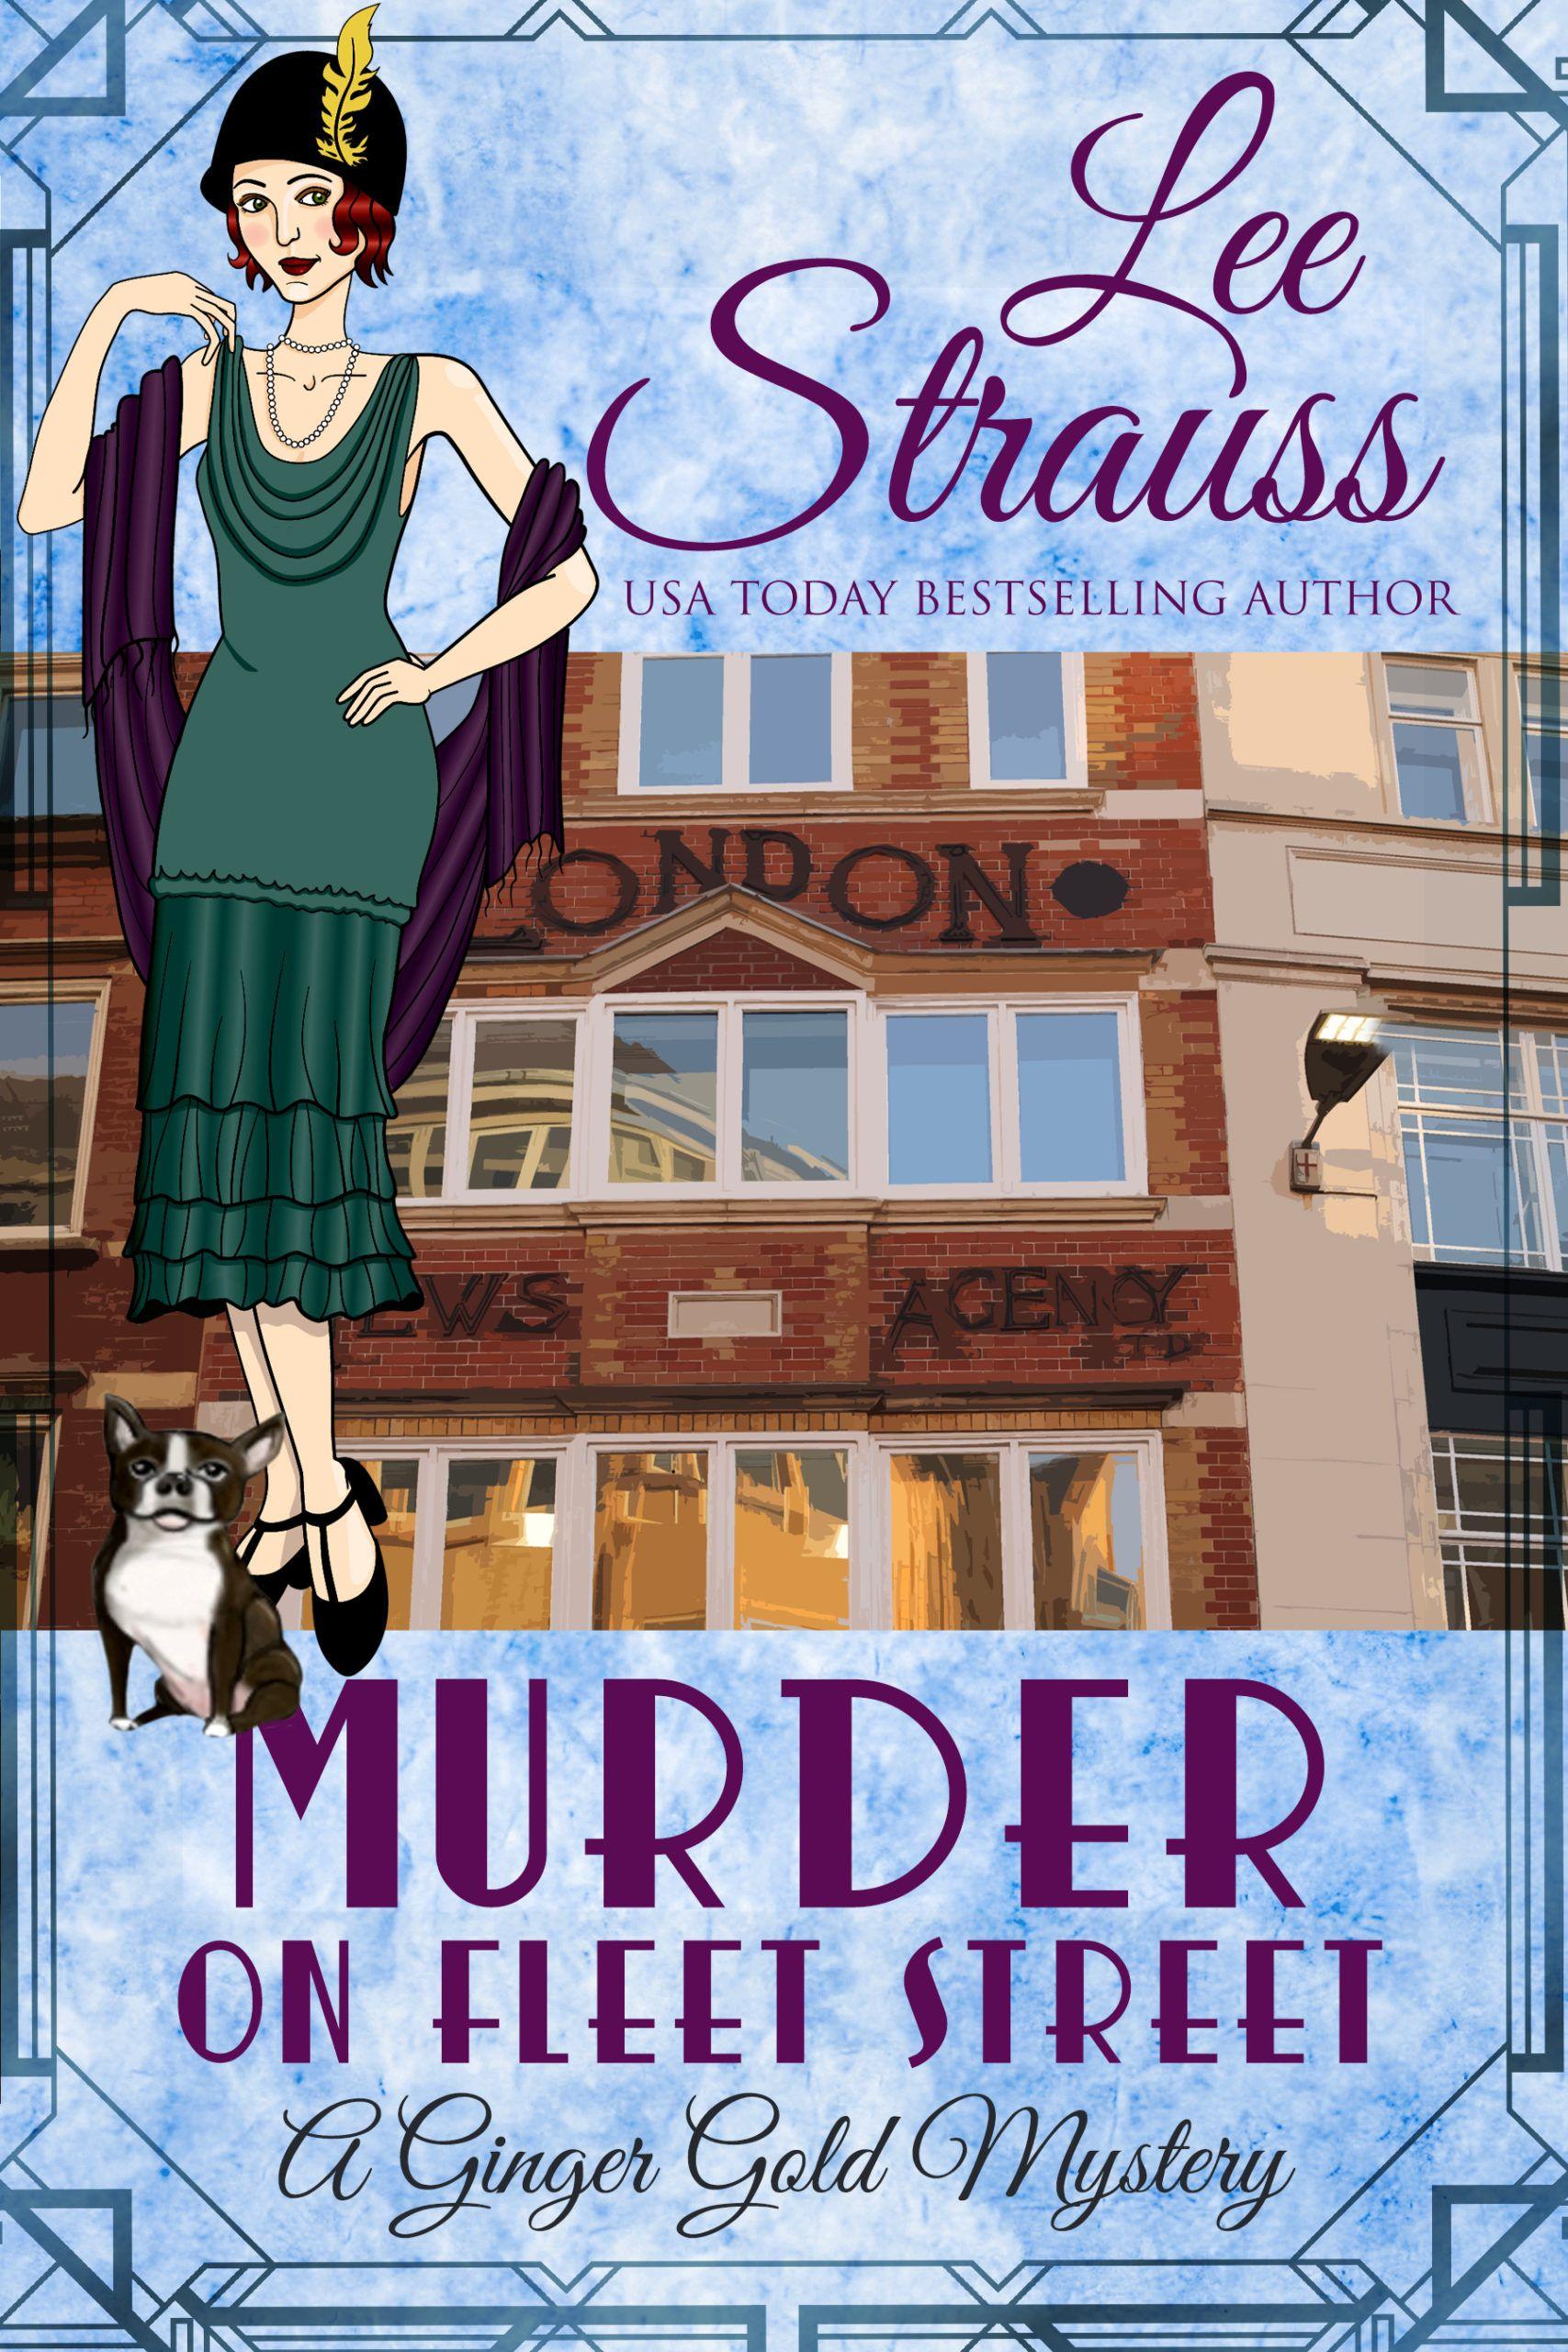 MurderFleetStreet_1920s